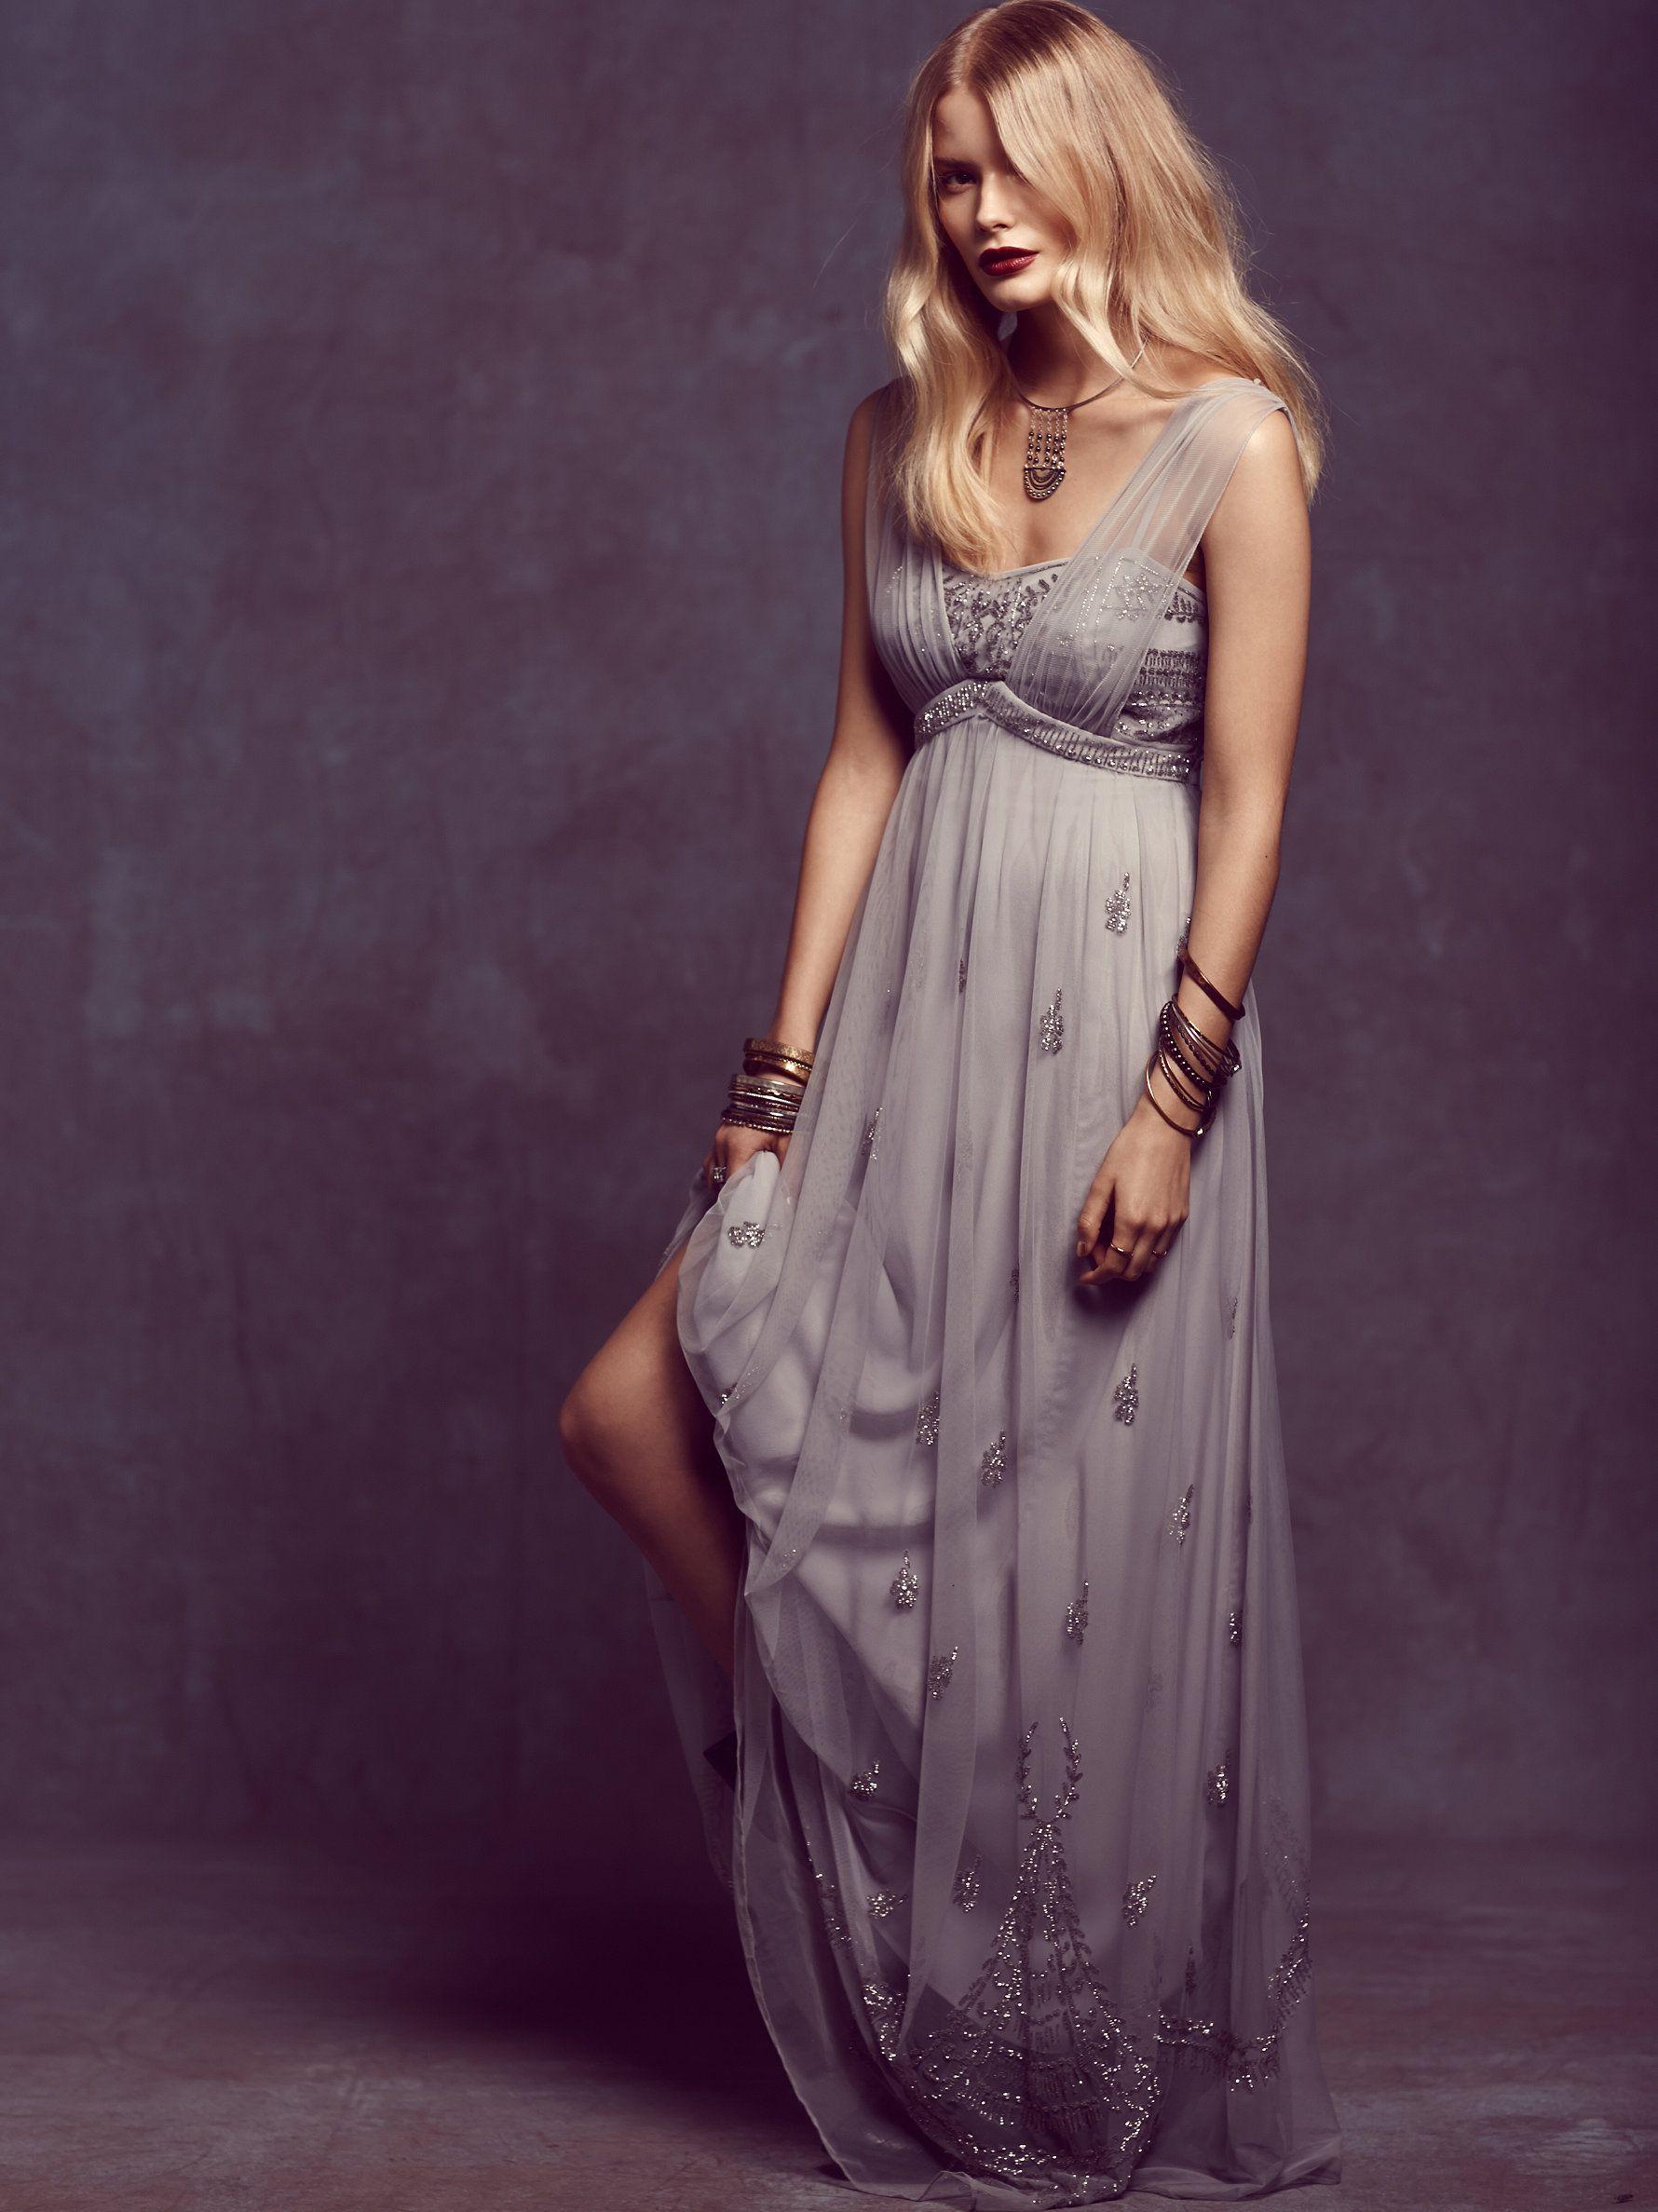 Free People Twilight Dreams Dress, $500.00 | Six Pack | Pinterest ...